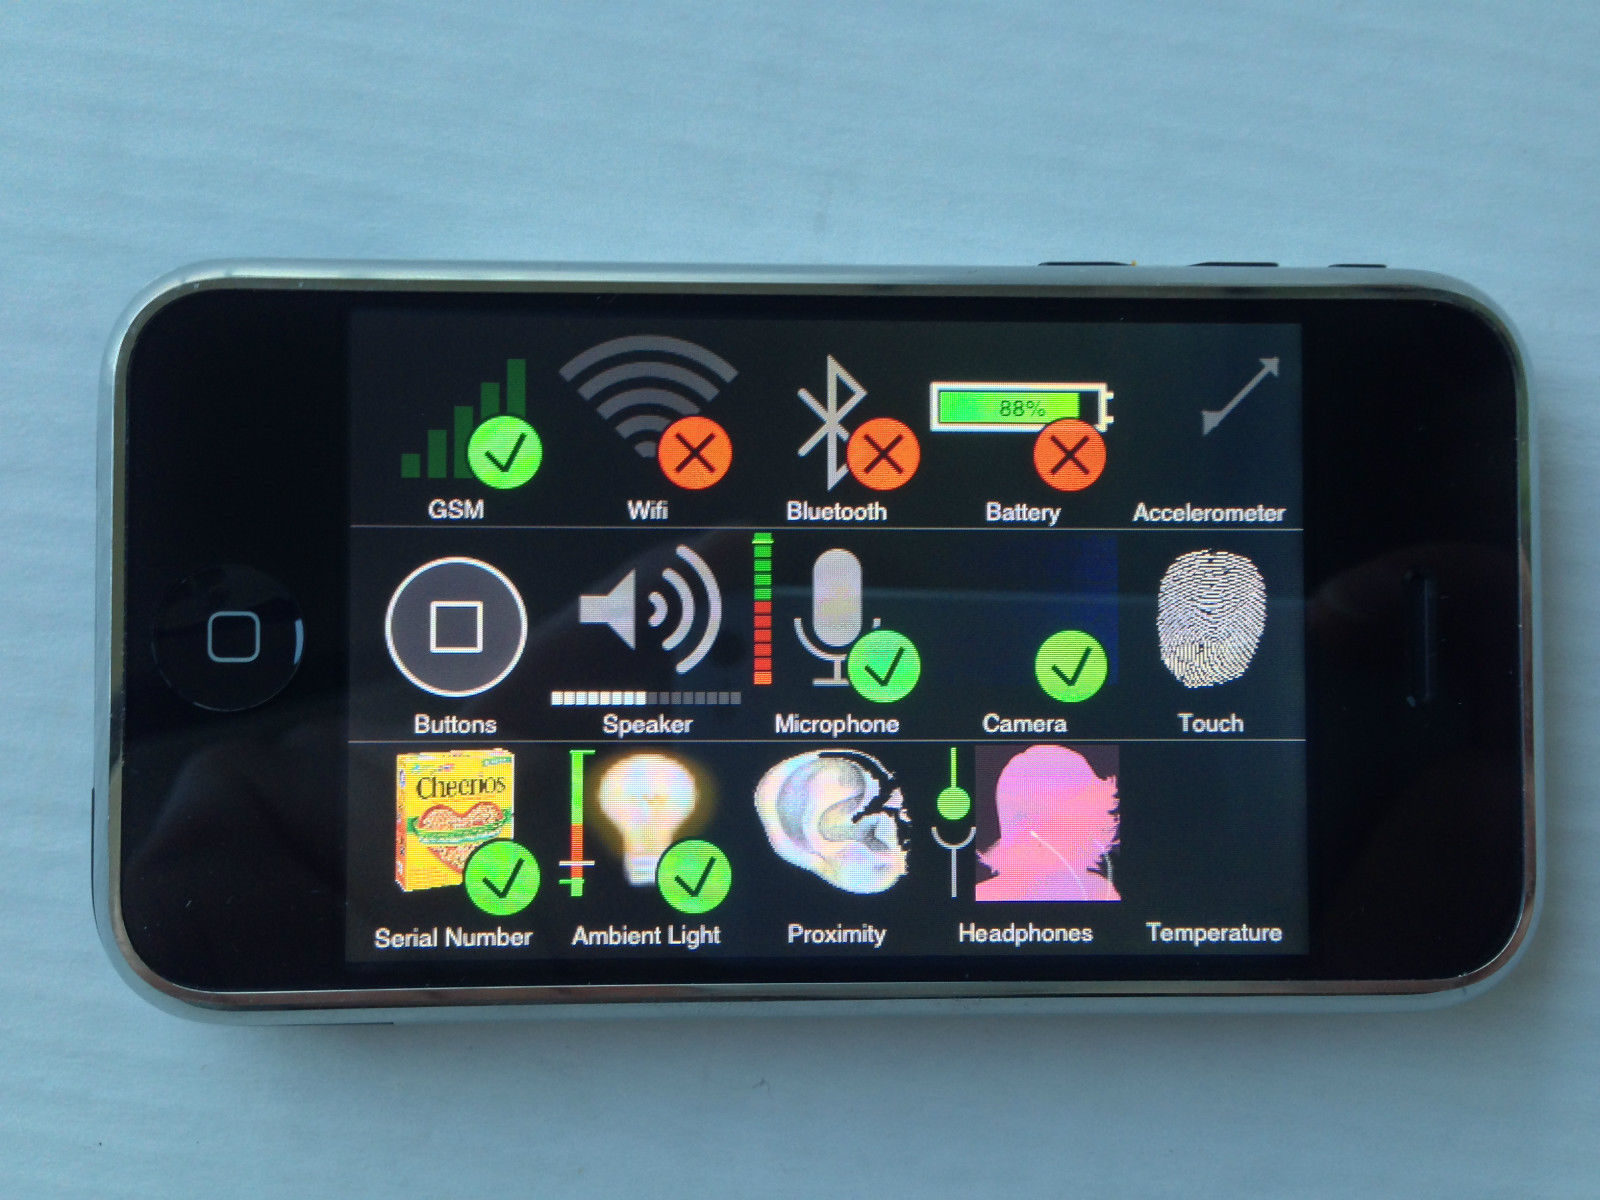 prototyp des ersten iphones f r dollar auf ebay verkauft giga. Black Bedroom Furniture Sets. Home Design Ideas